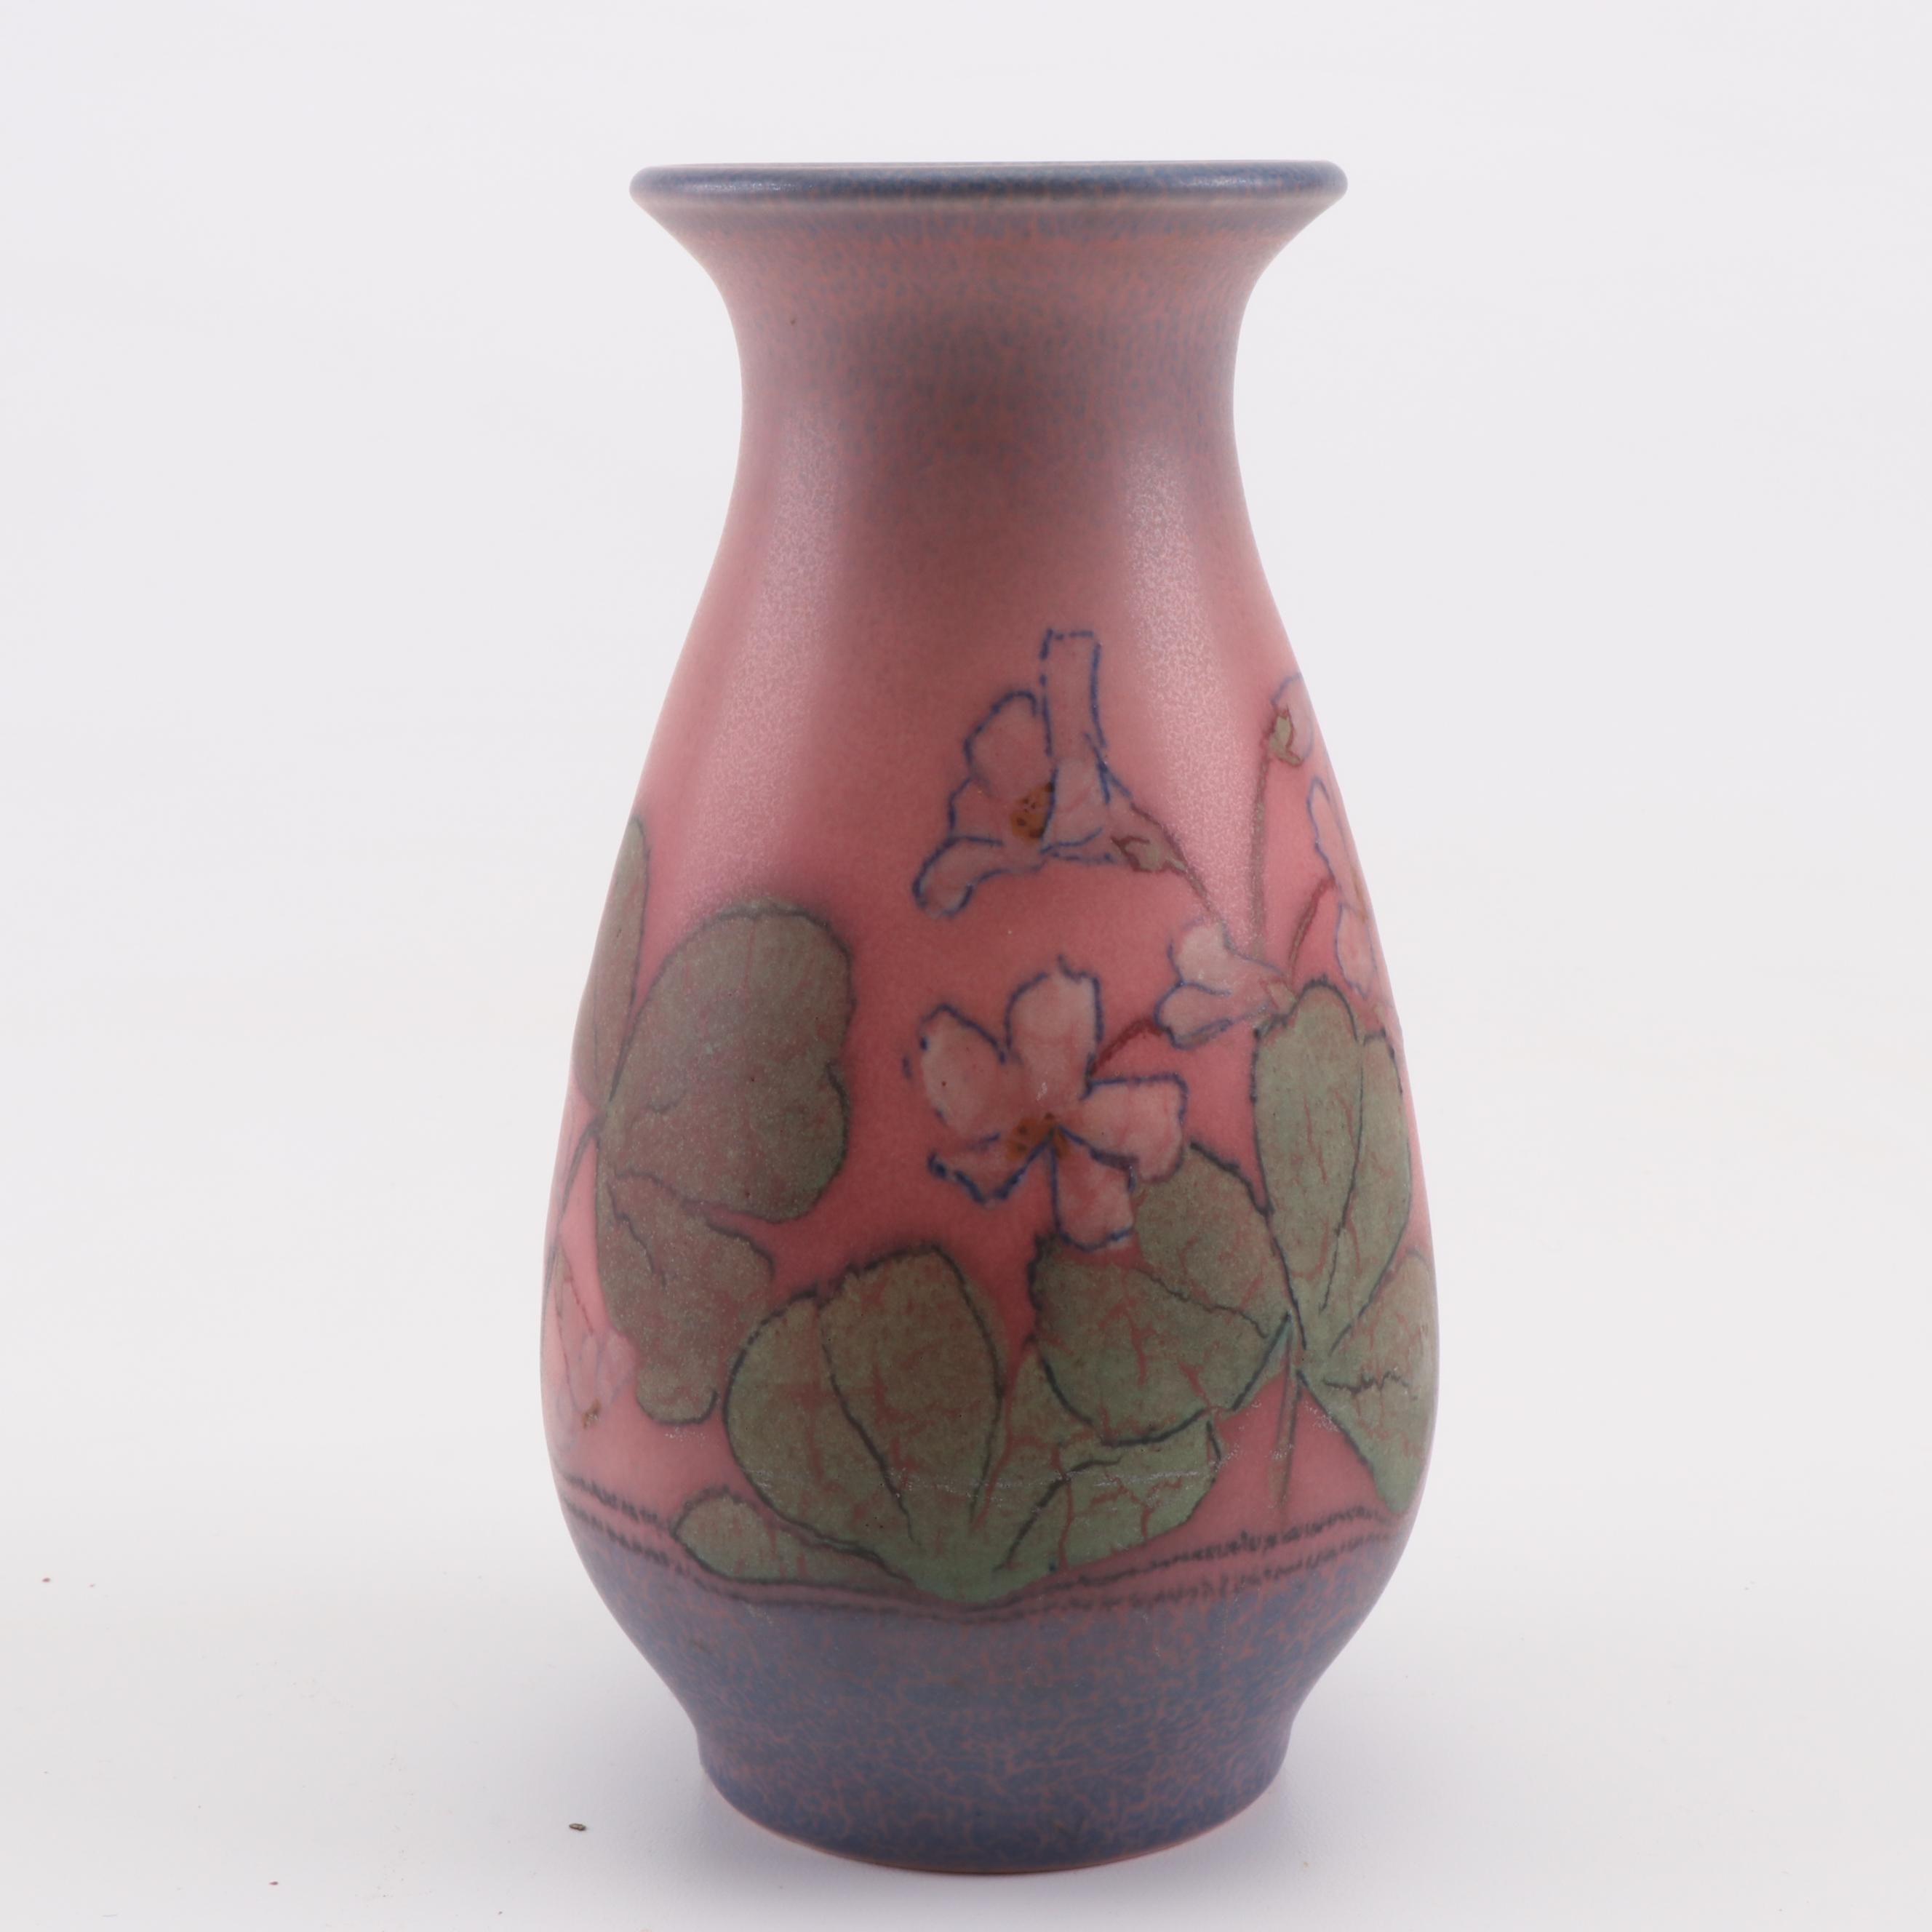 Rookwood Kataro Shirayamadani Vase, circa 1932